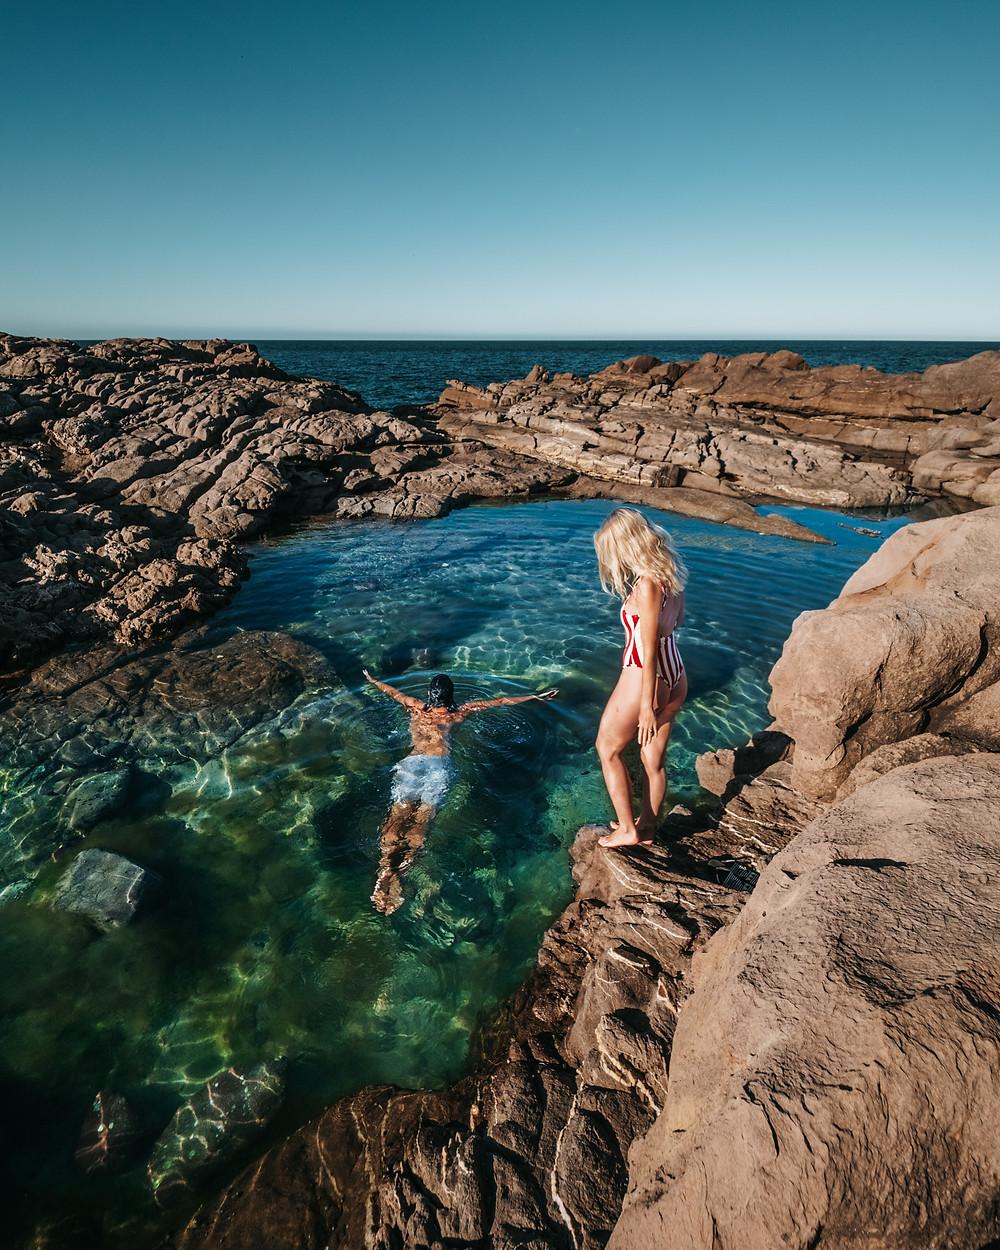 Tura Head rock pools, Sapphire Coast, NSW Australia (road trip)